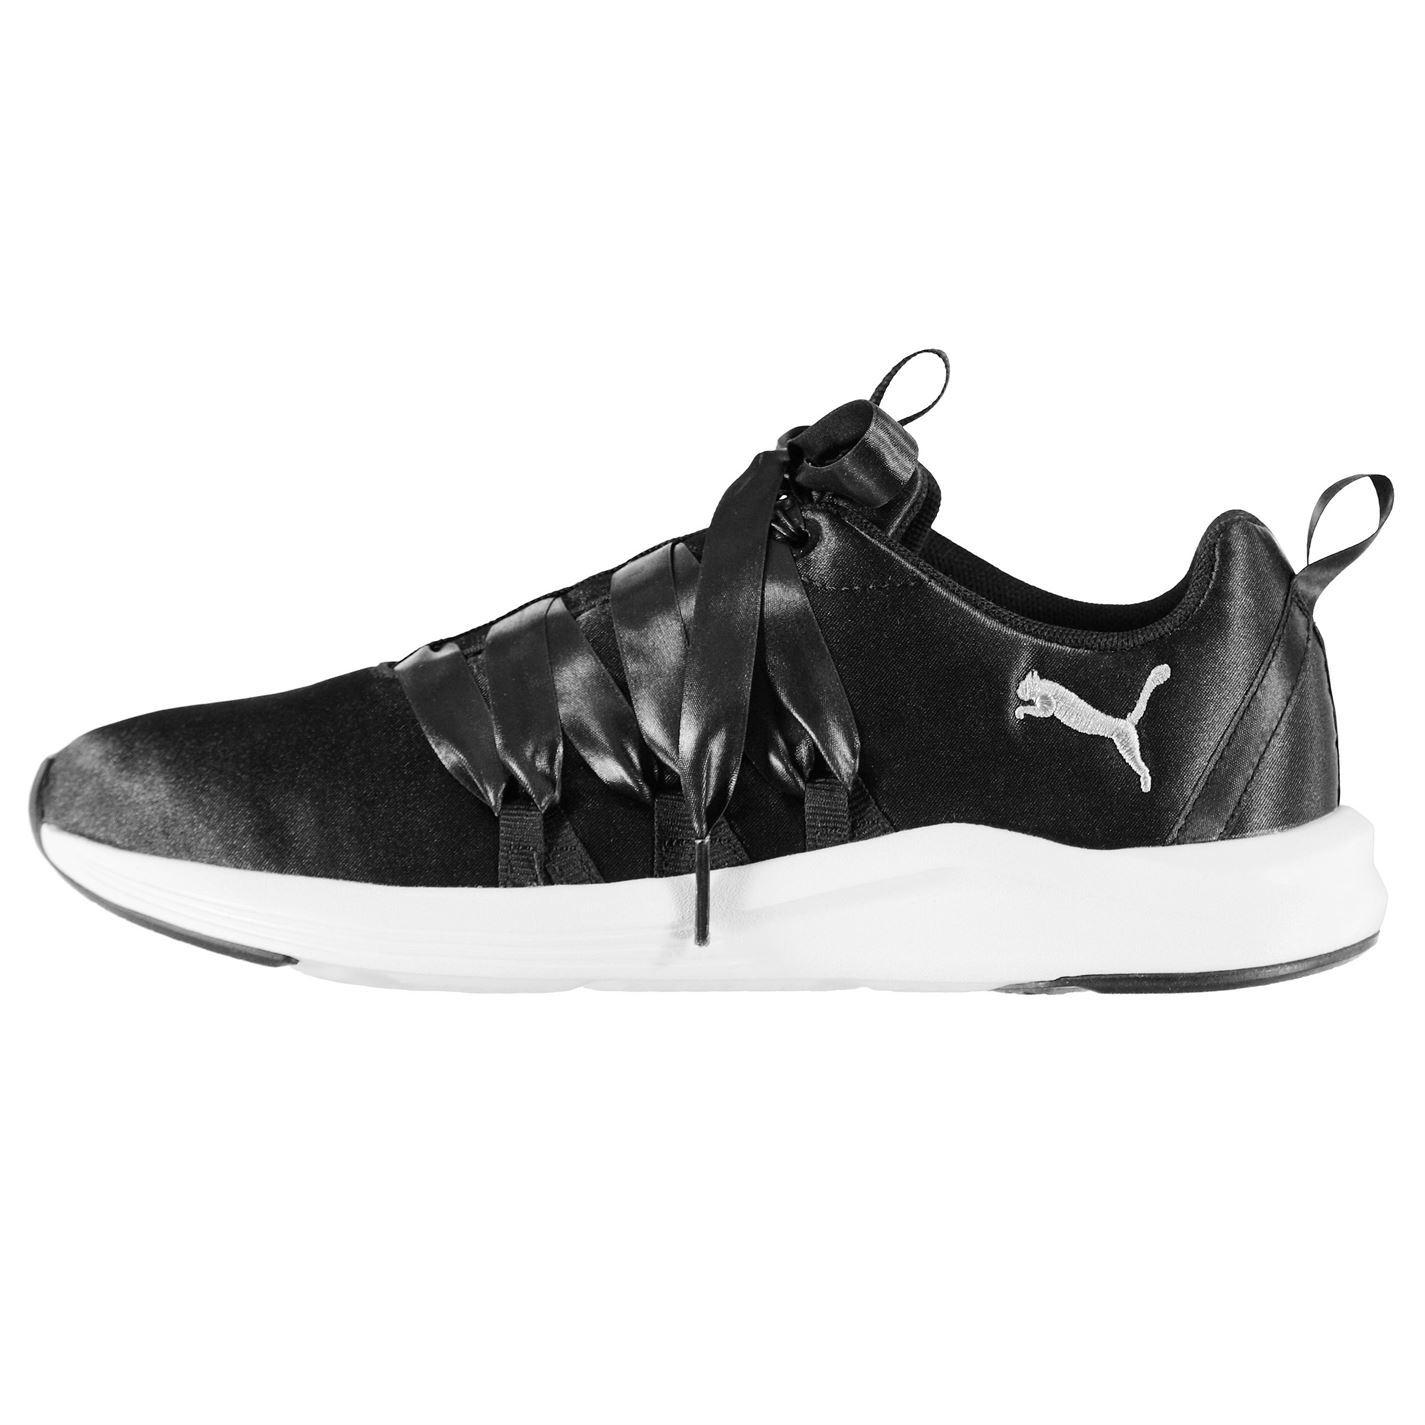 94e5989a4a7 Puma Prowl Alt Satin Fitness Training Shoes Womens Black White Gym Sneakers